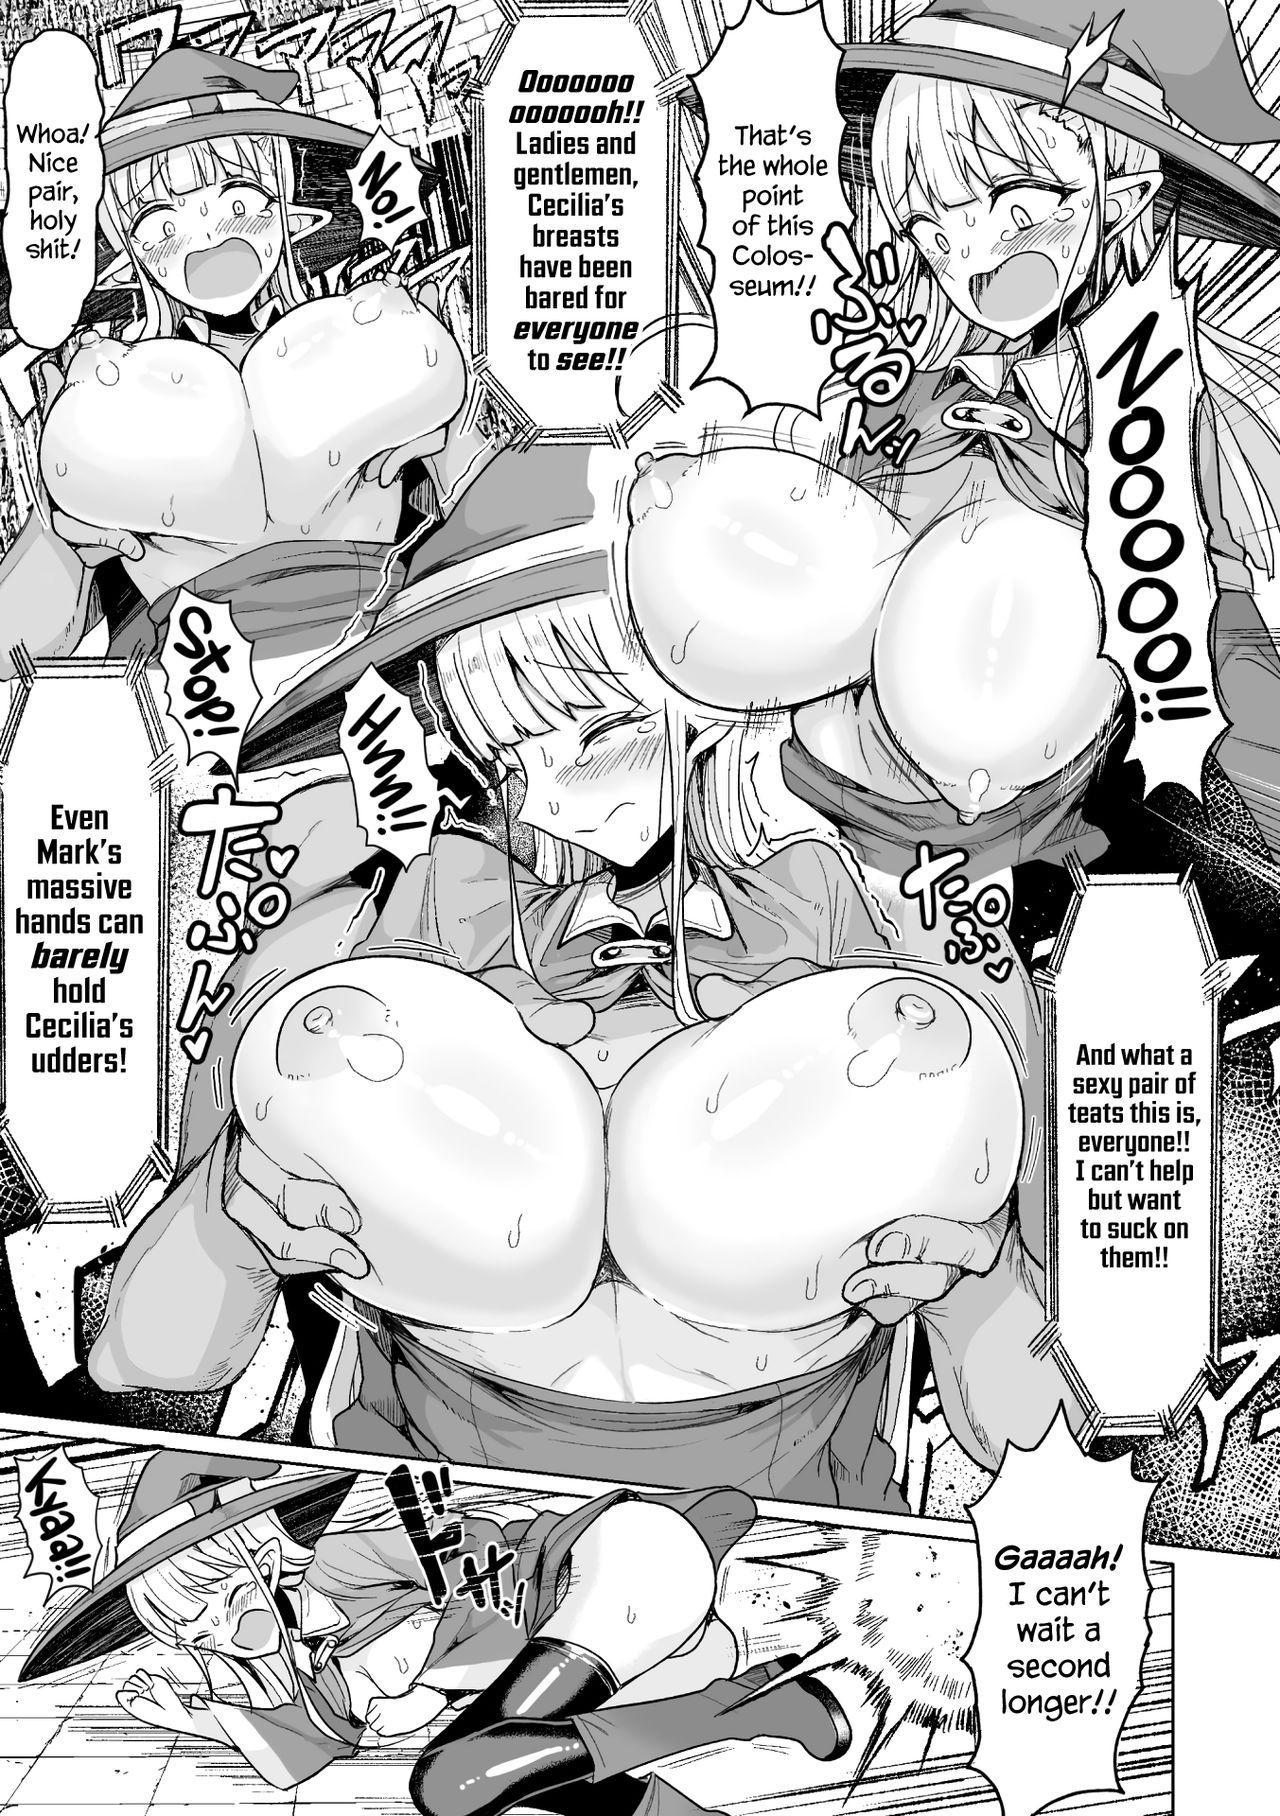 Tanetsuke Colosseum! Episode 1 | Conception Colosseum! 1 9